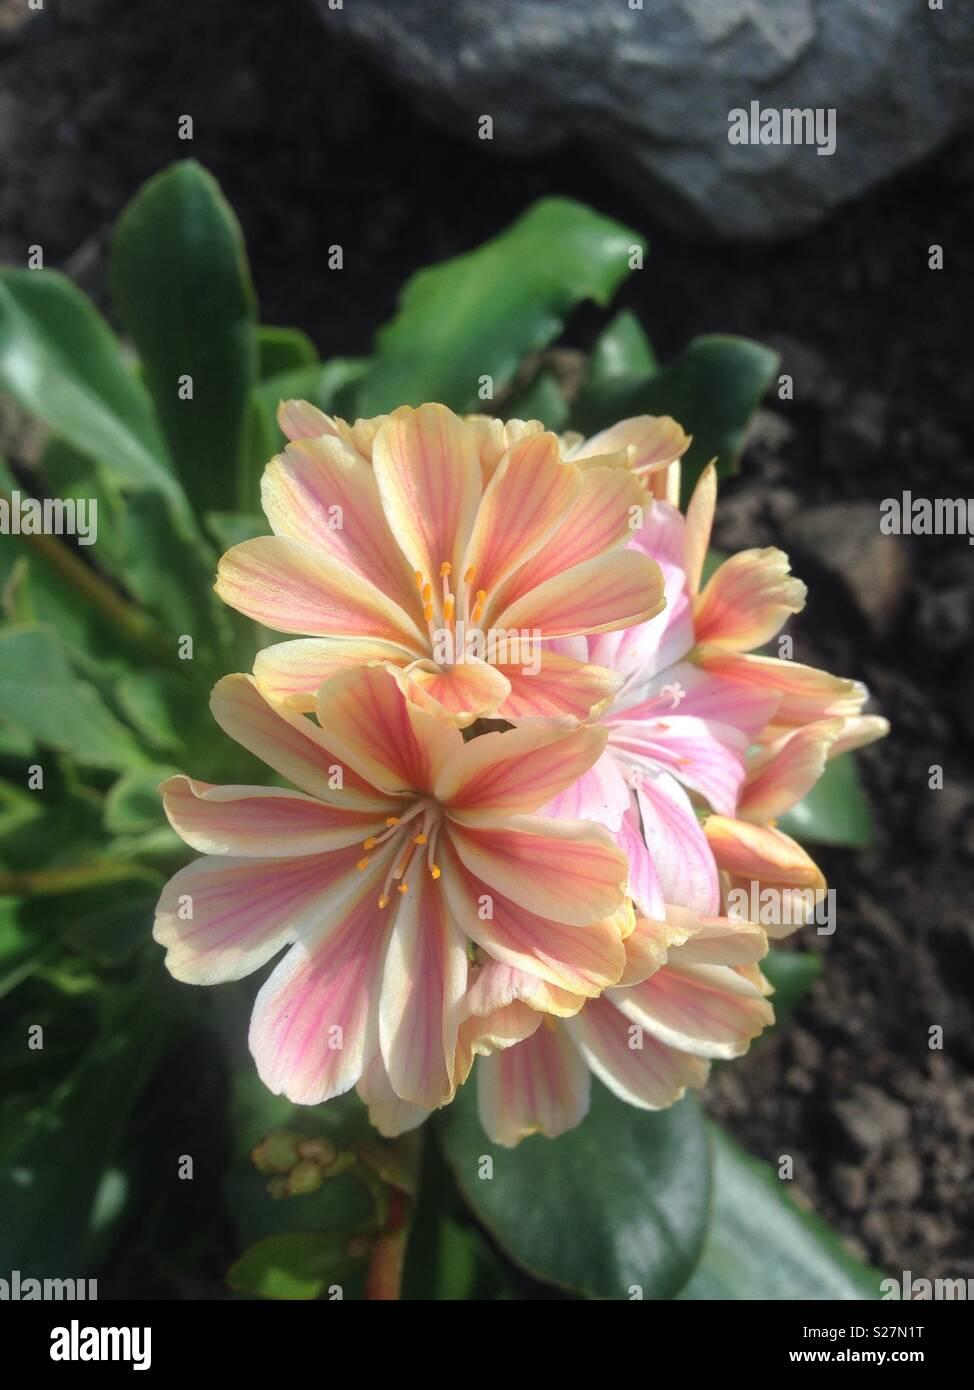 Peach flowers - Stock Image